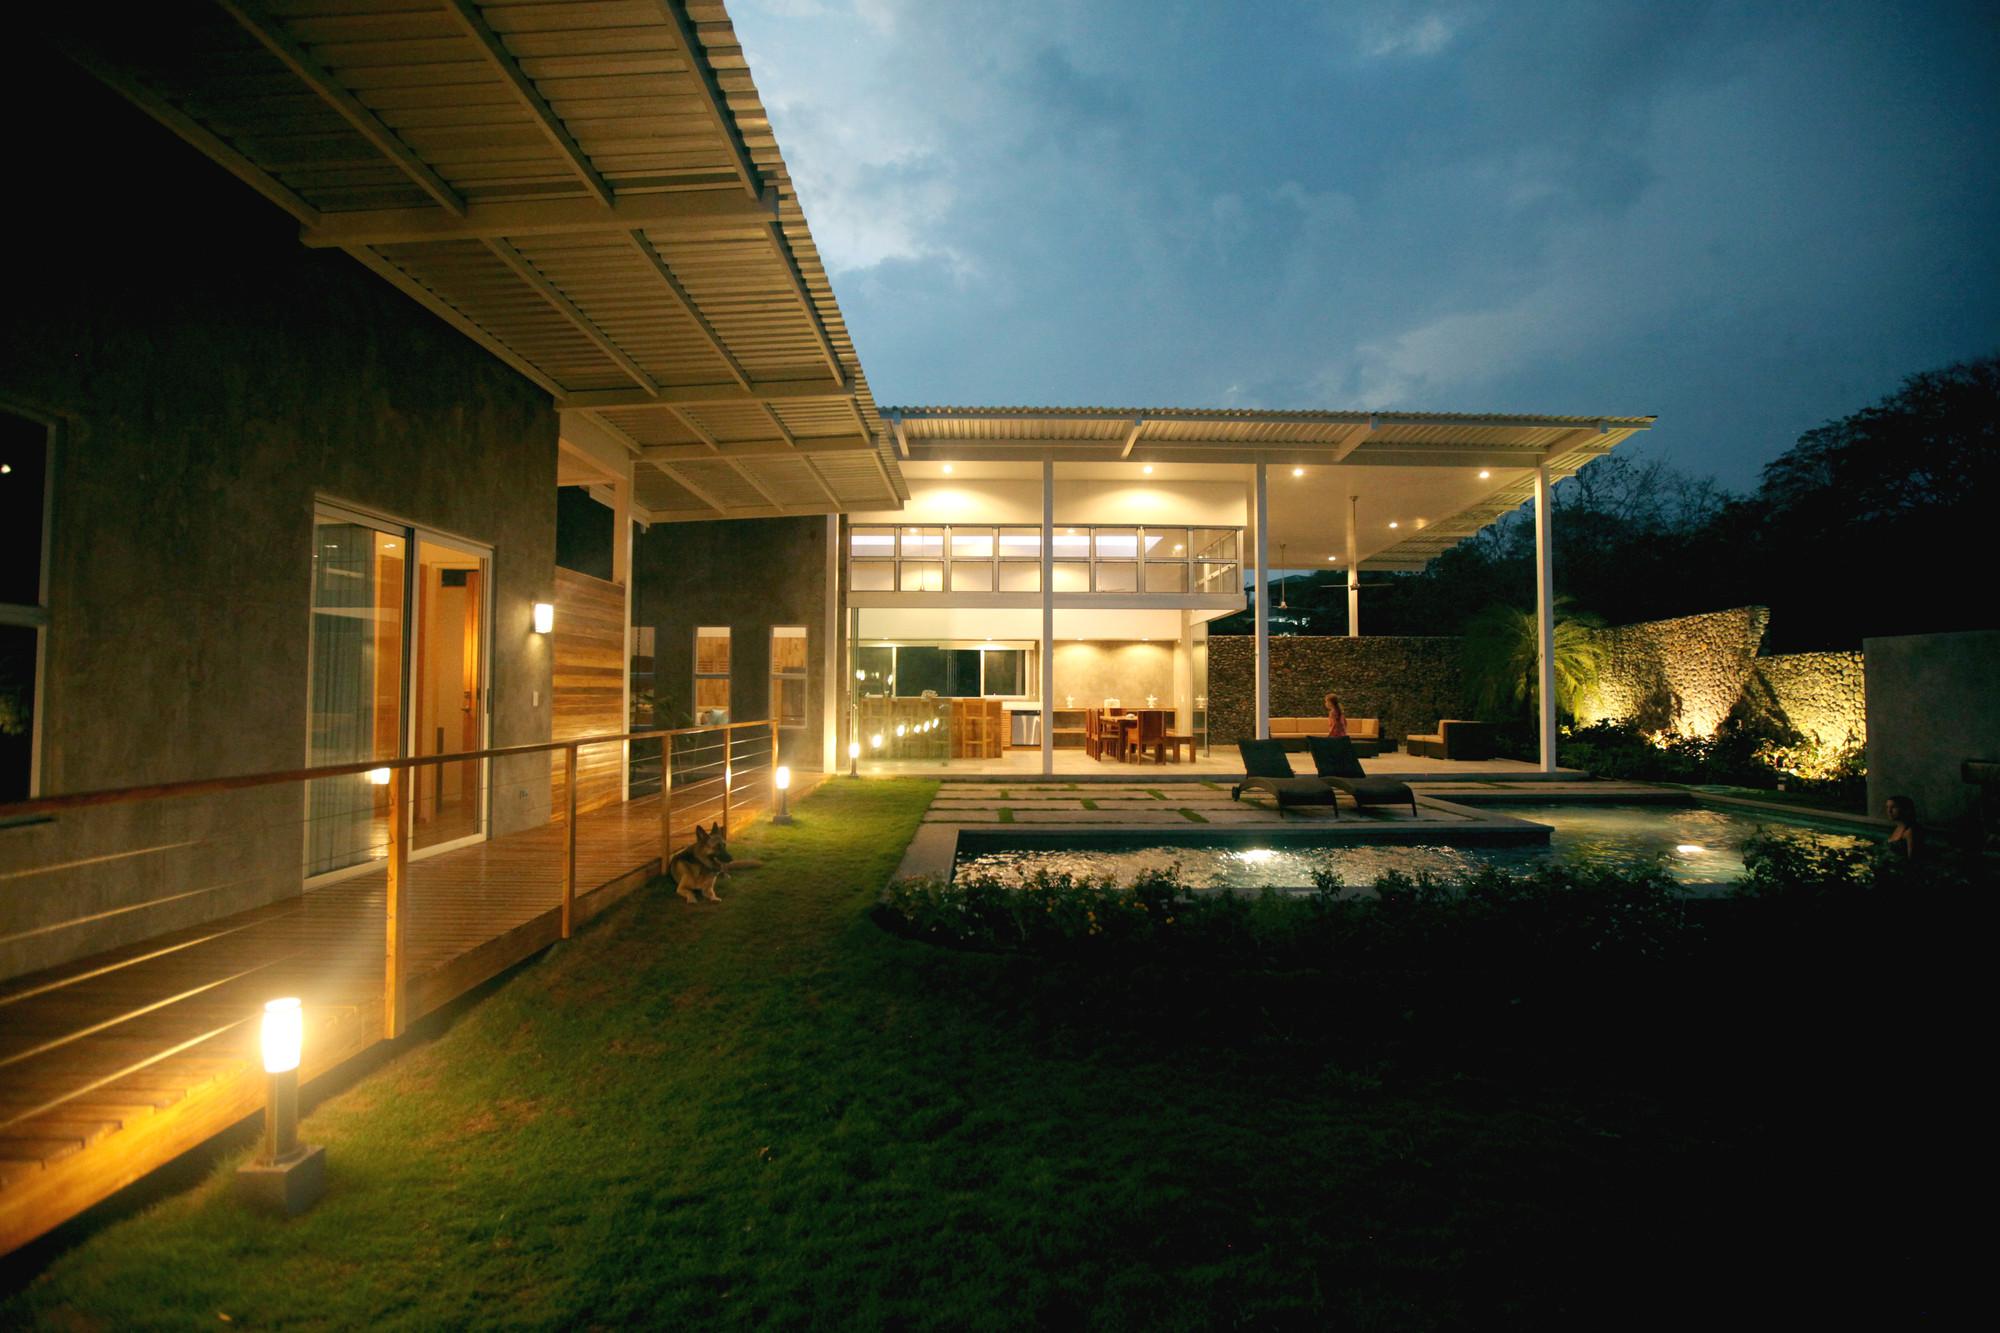 Galer a de casa jard n del mar salagnac arquitectos 4 for Casas jardin del mar